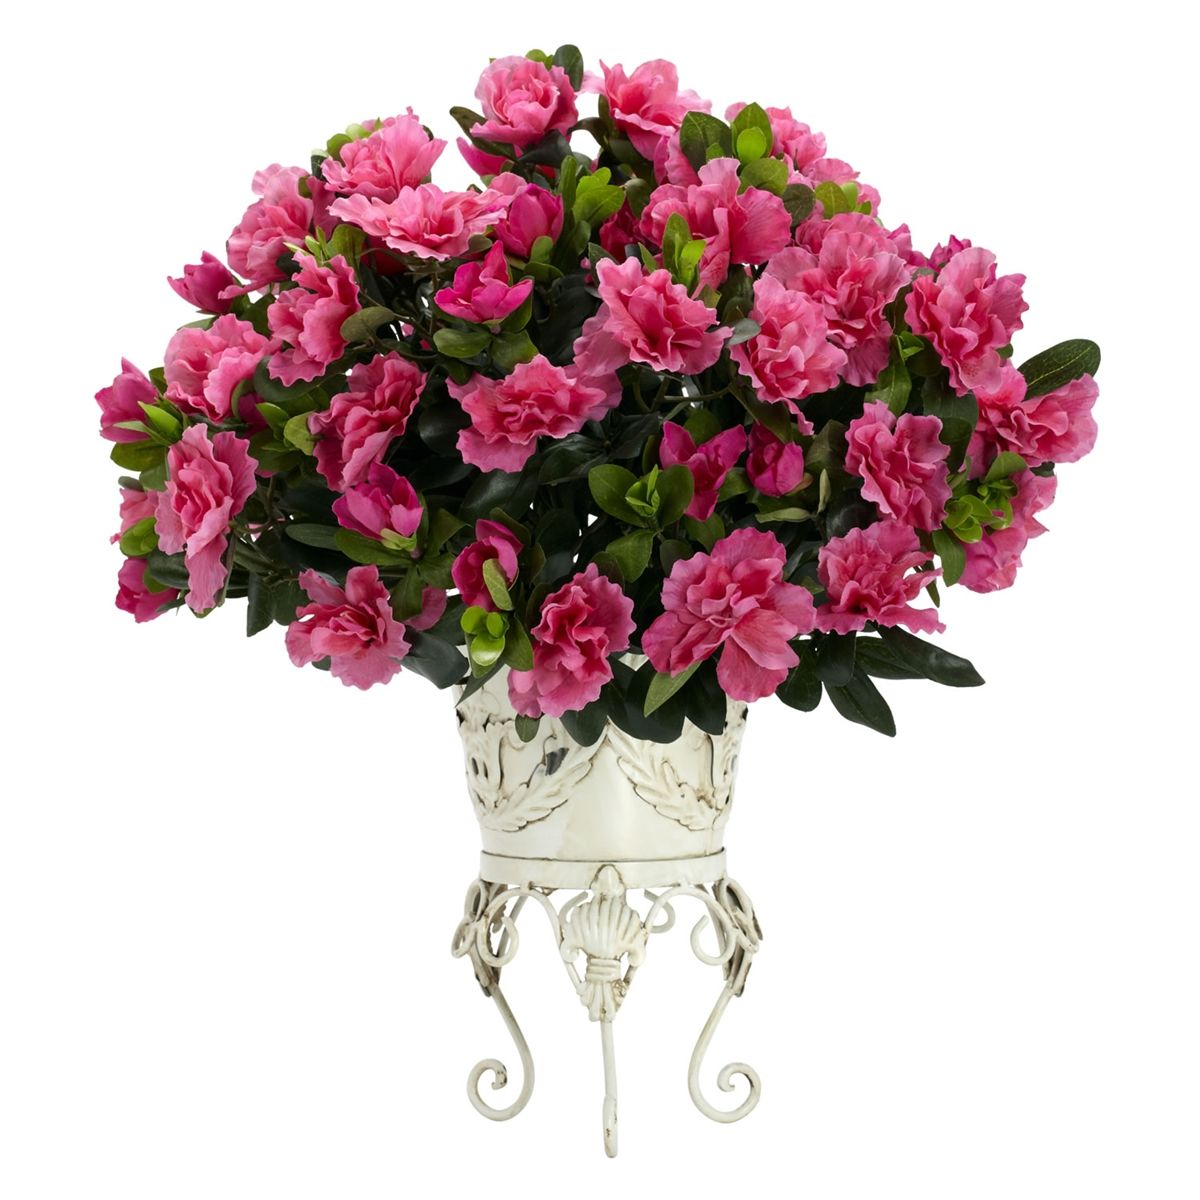 Pink Azalea Vintage Look Metal Stand Flower Arrangement Blueberry Creek Gift Baskets Silk Plants Faux Floral Arrangement Silk Flower Arrangements